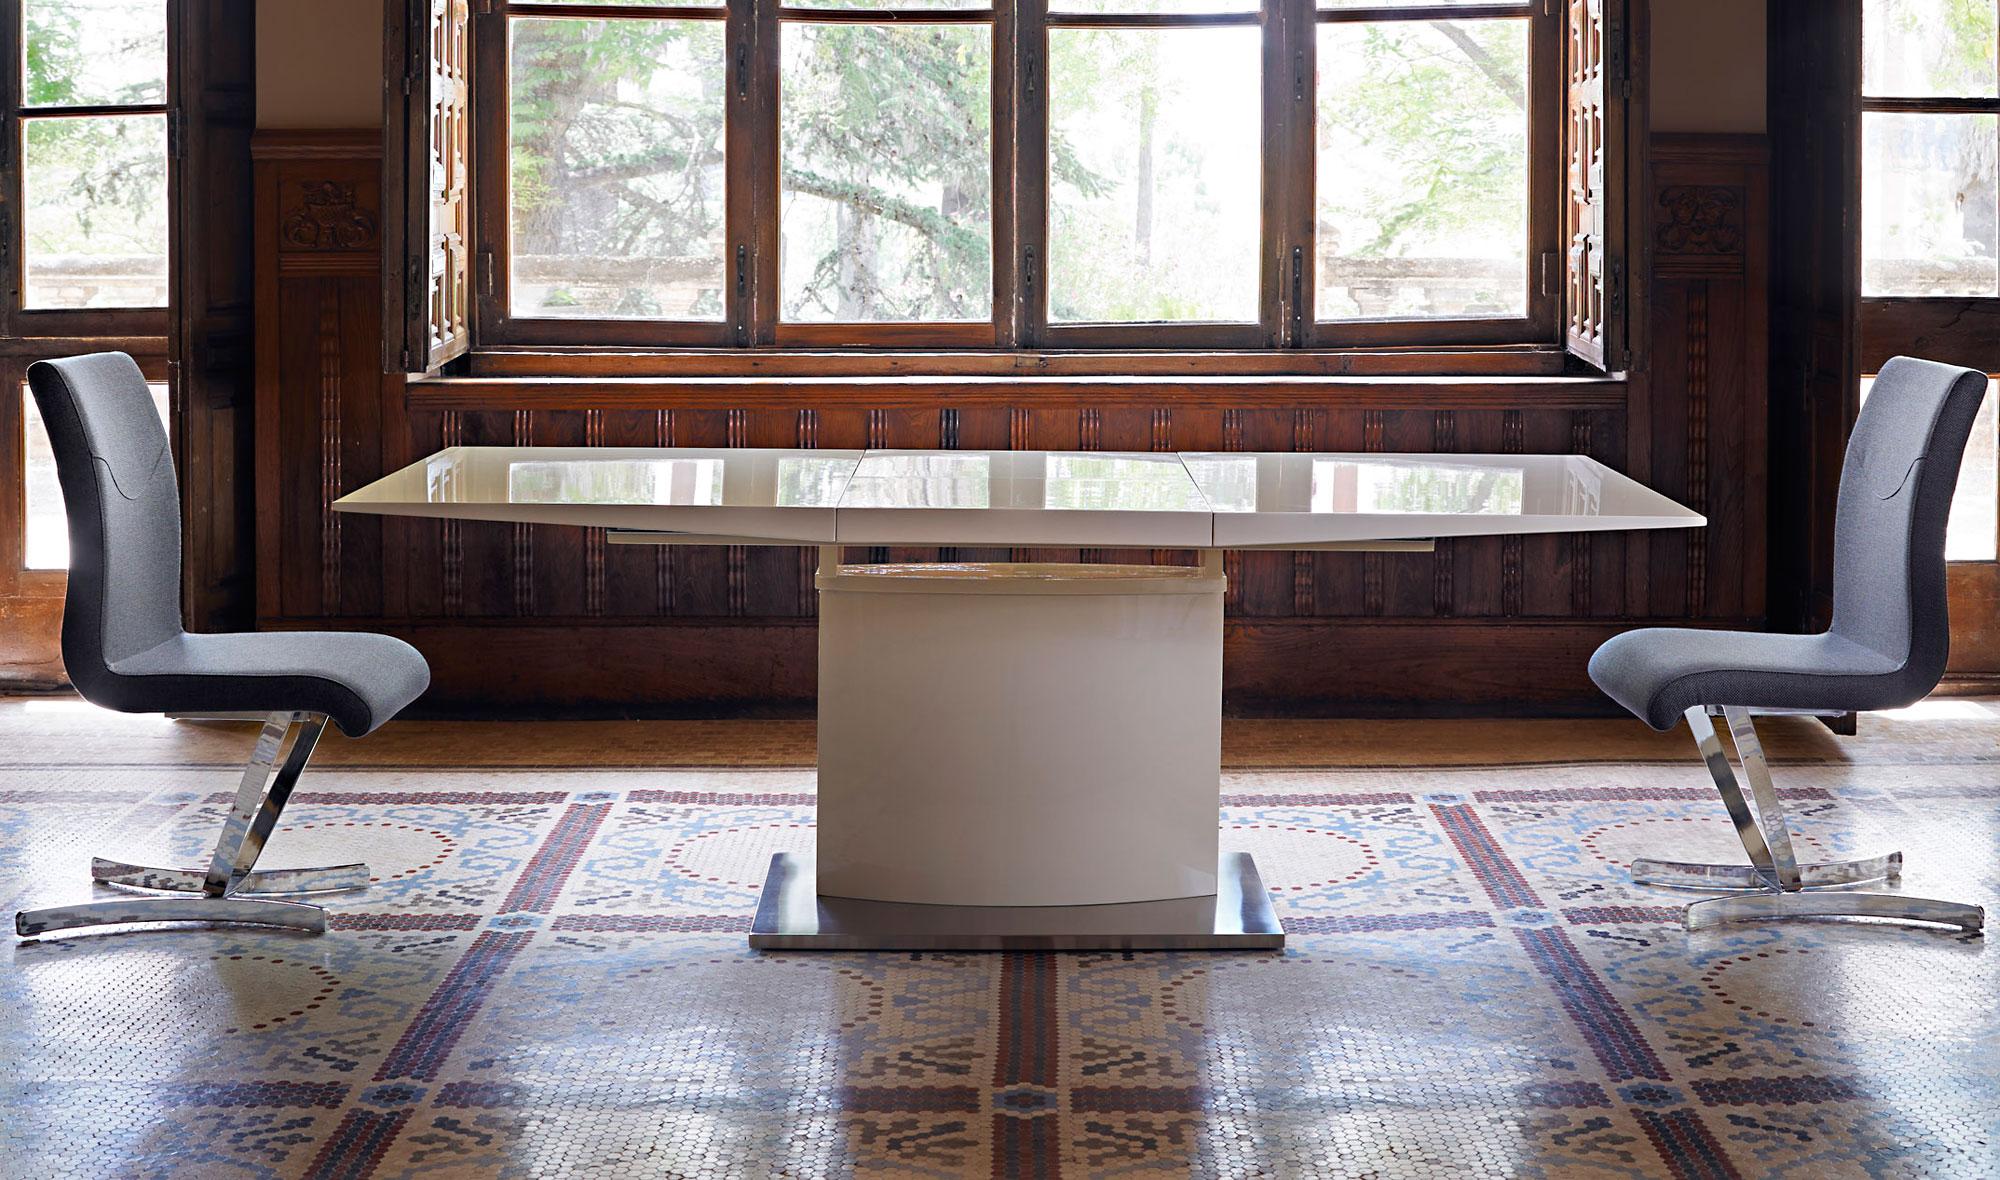 Mesa de comedor extensible moderna nexus no disponible en - Mesa comedor extensible moderna ...